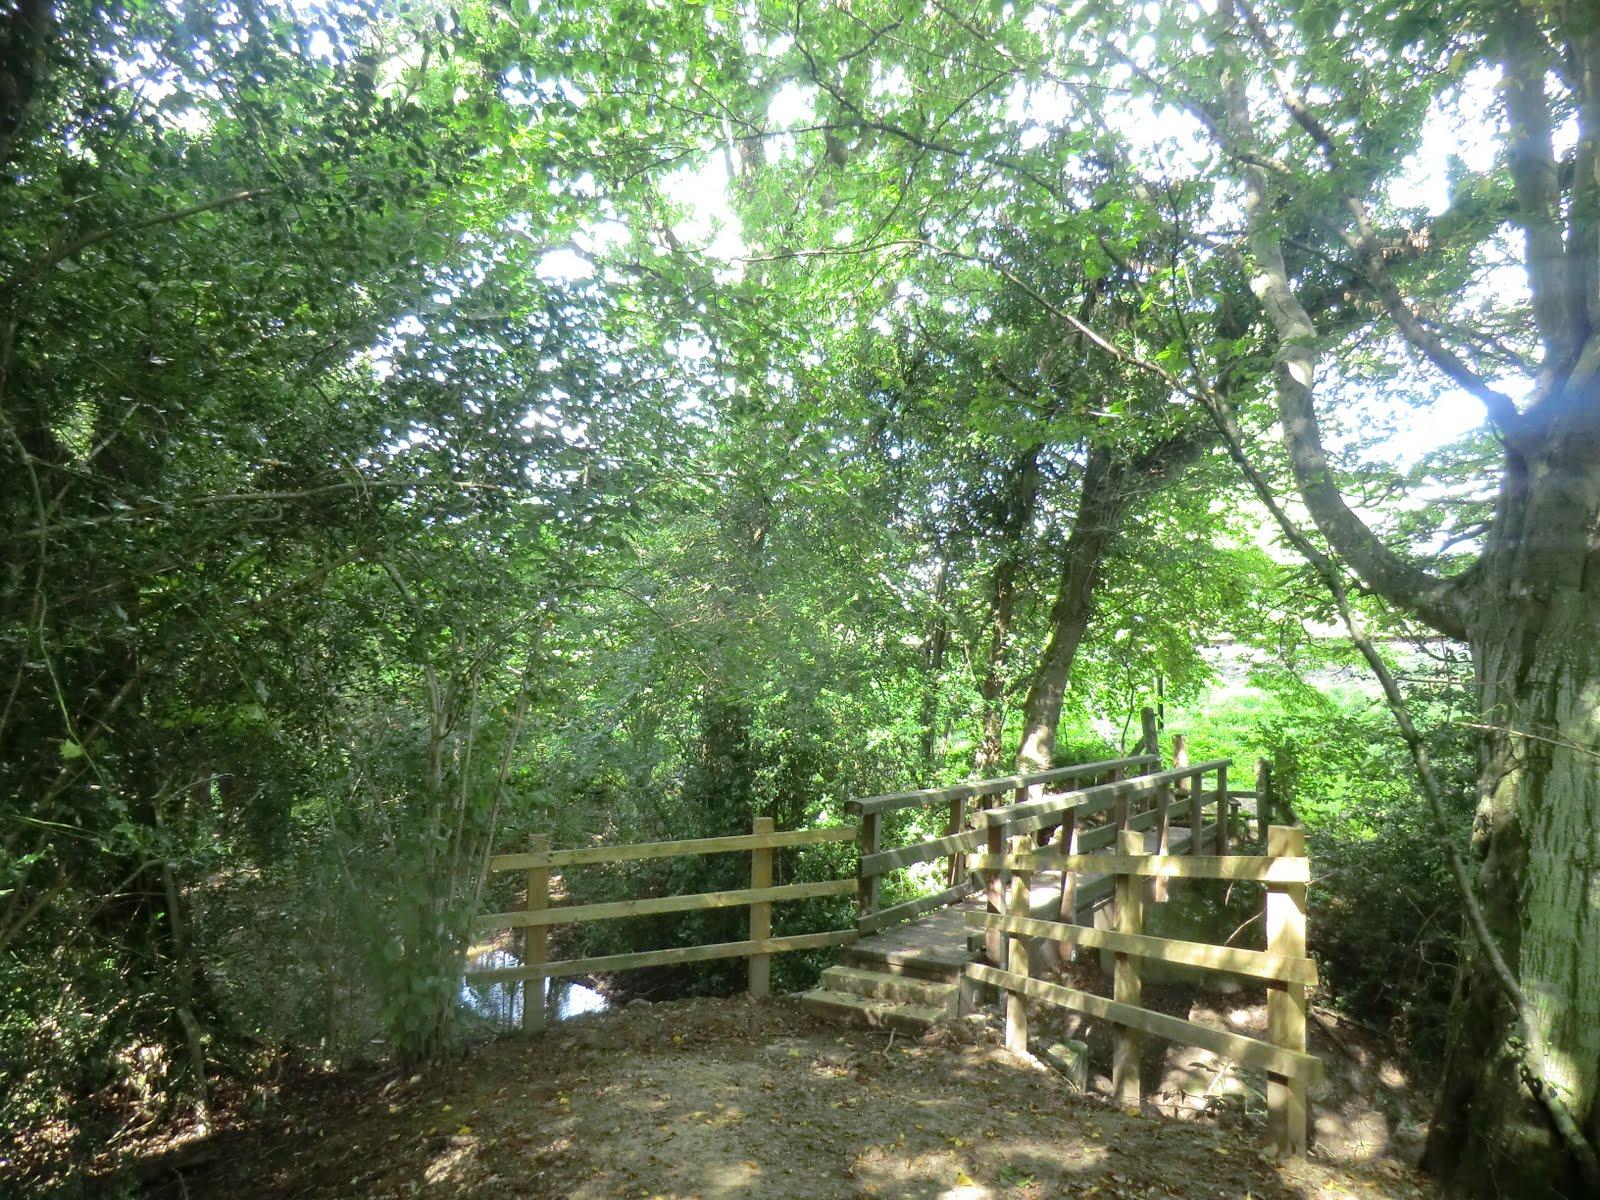 CIMG4701 Footbridge across Danehill Brook